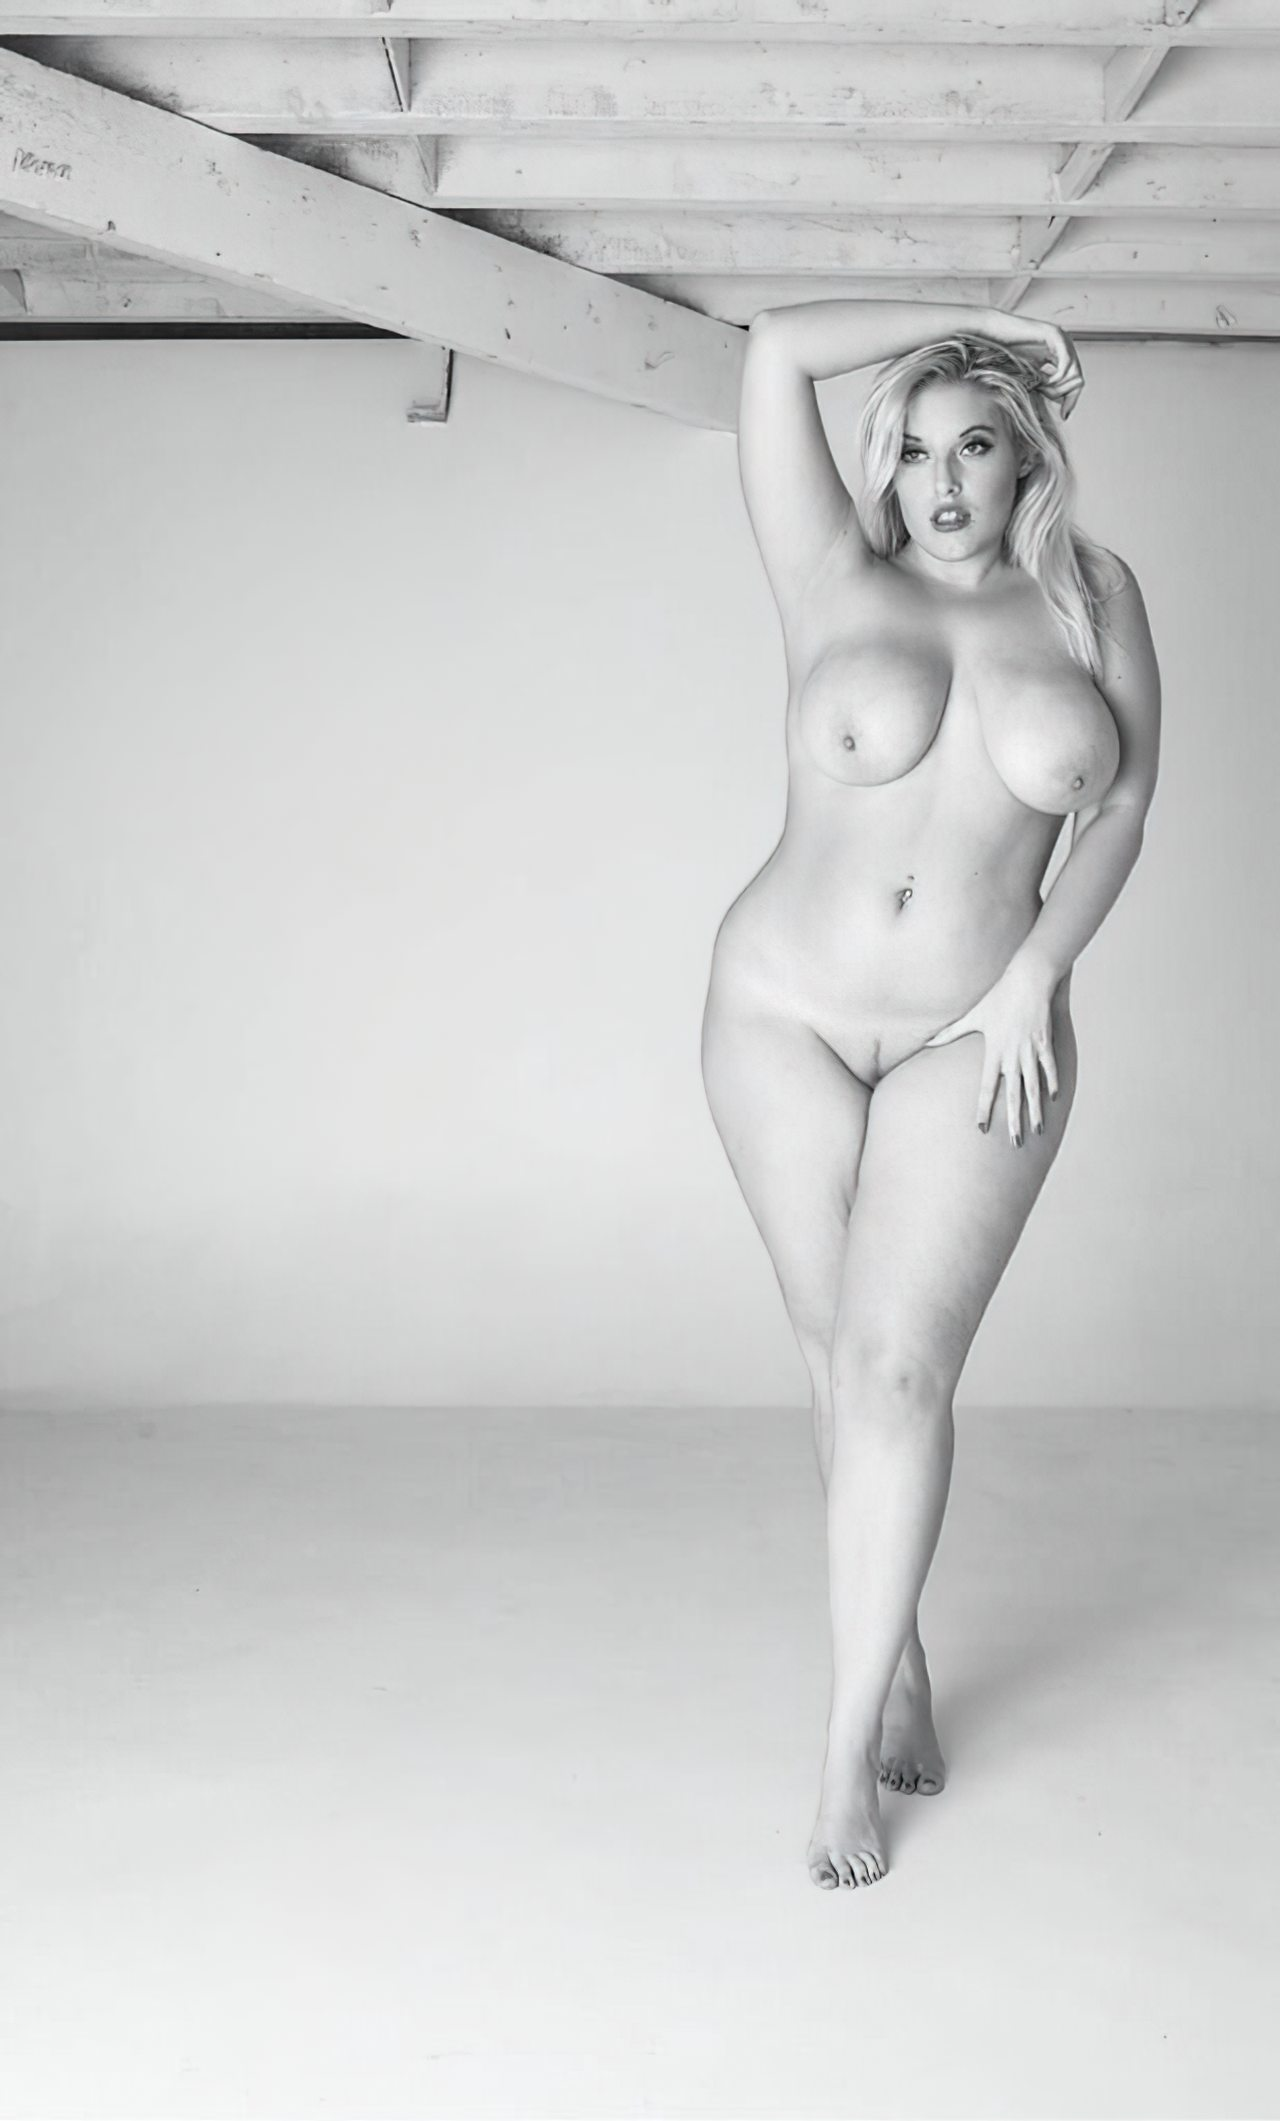 Fotos de Mulheres (33)